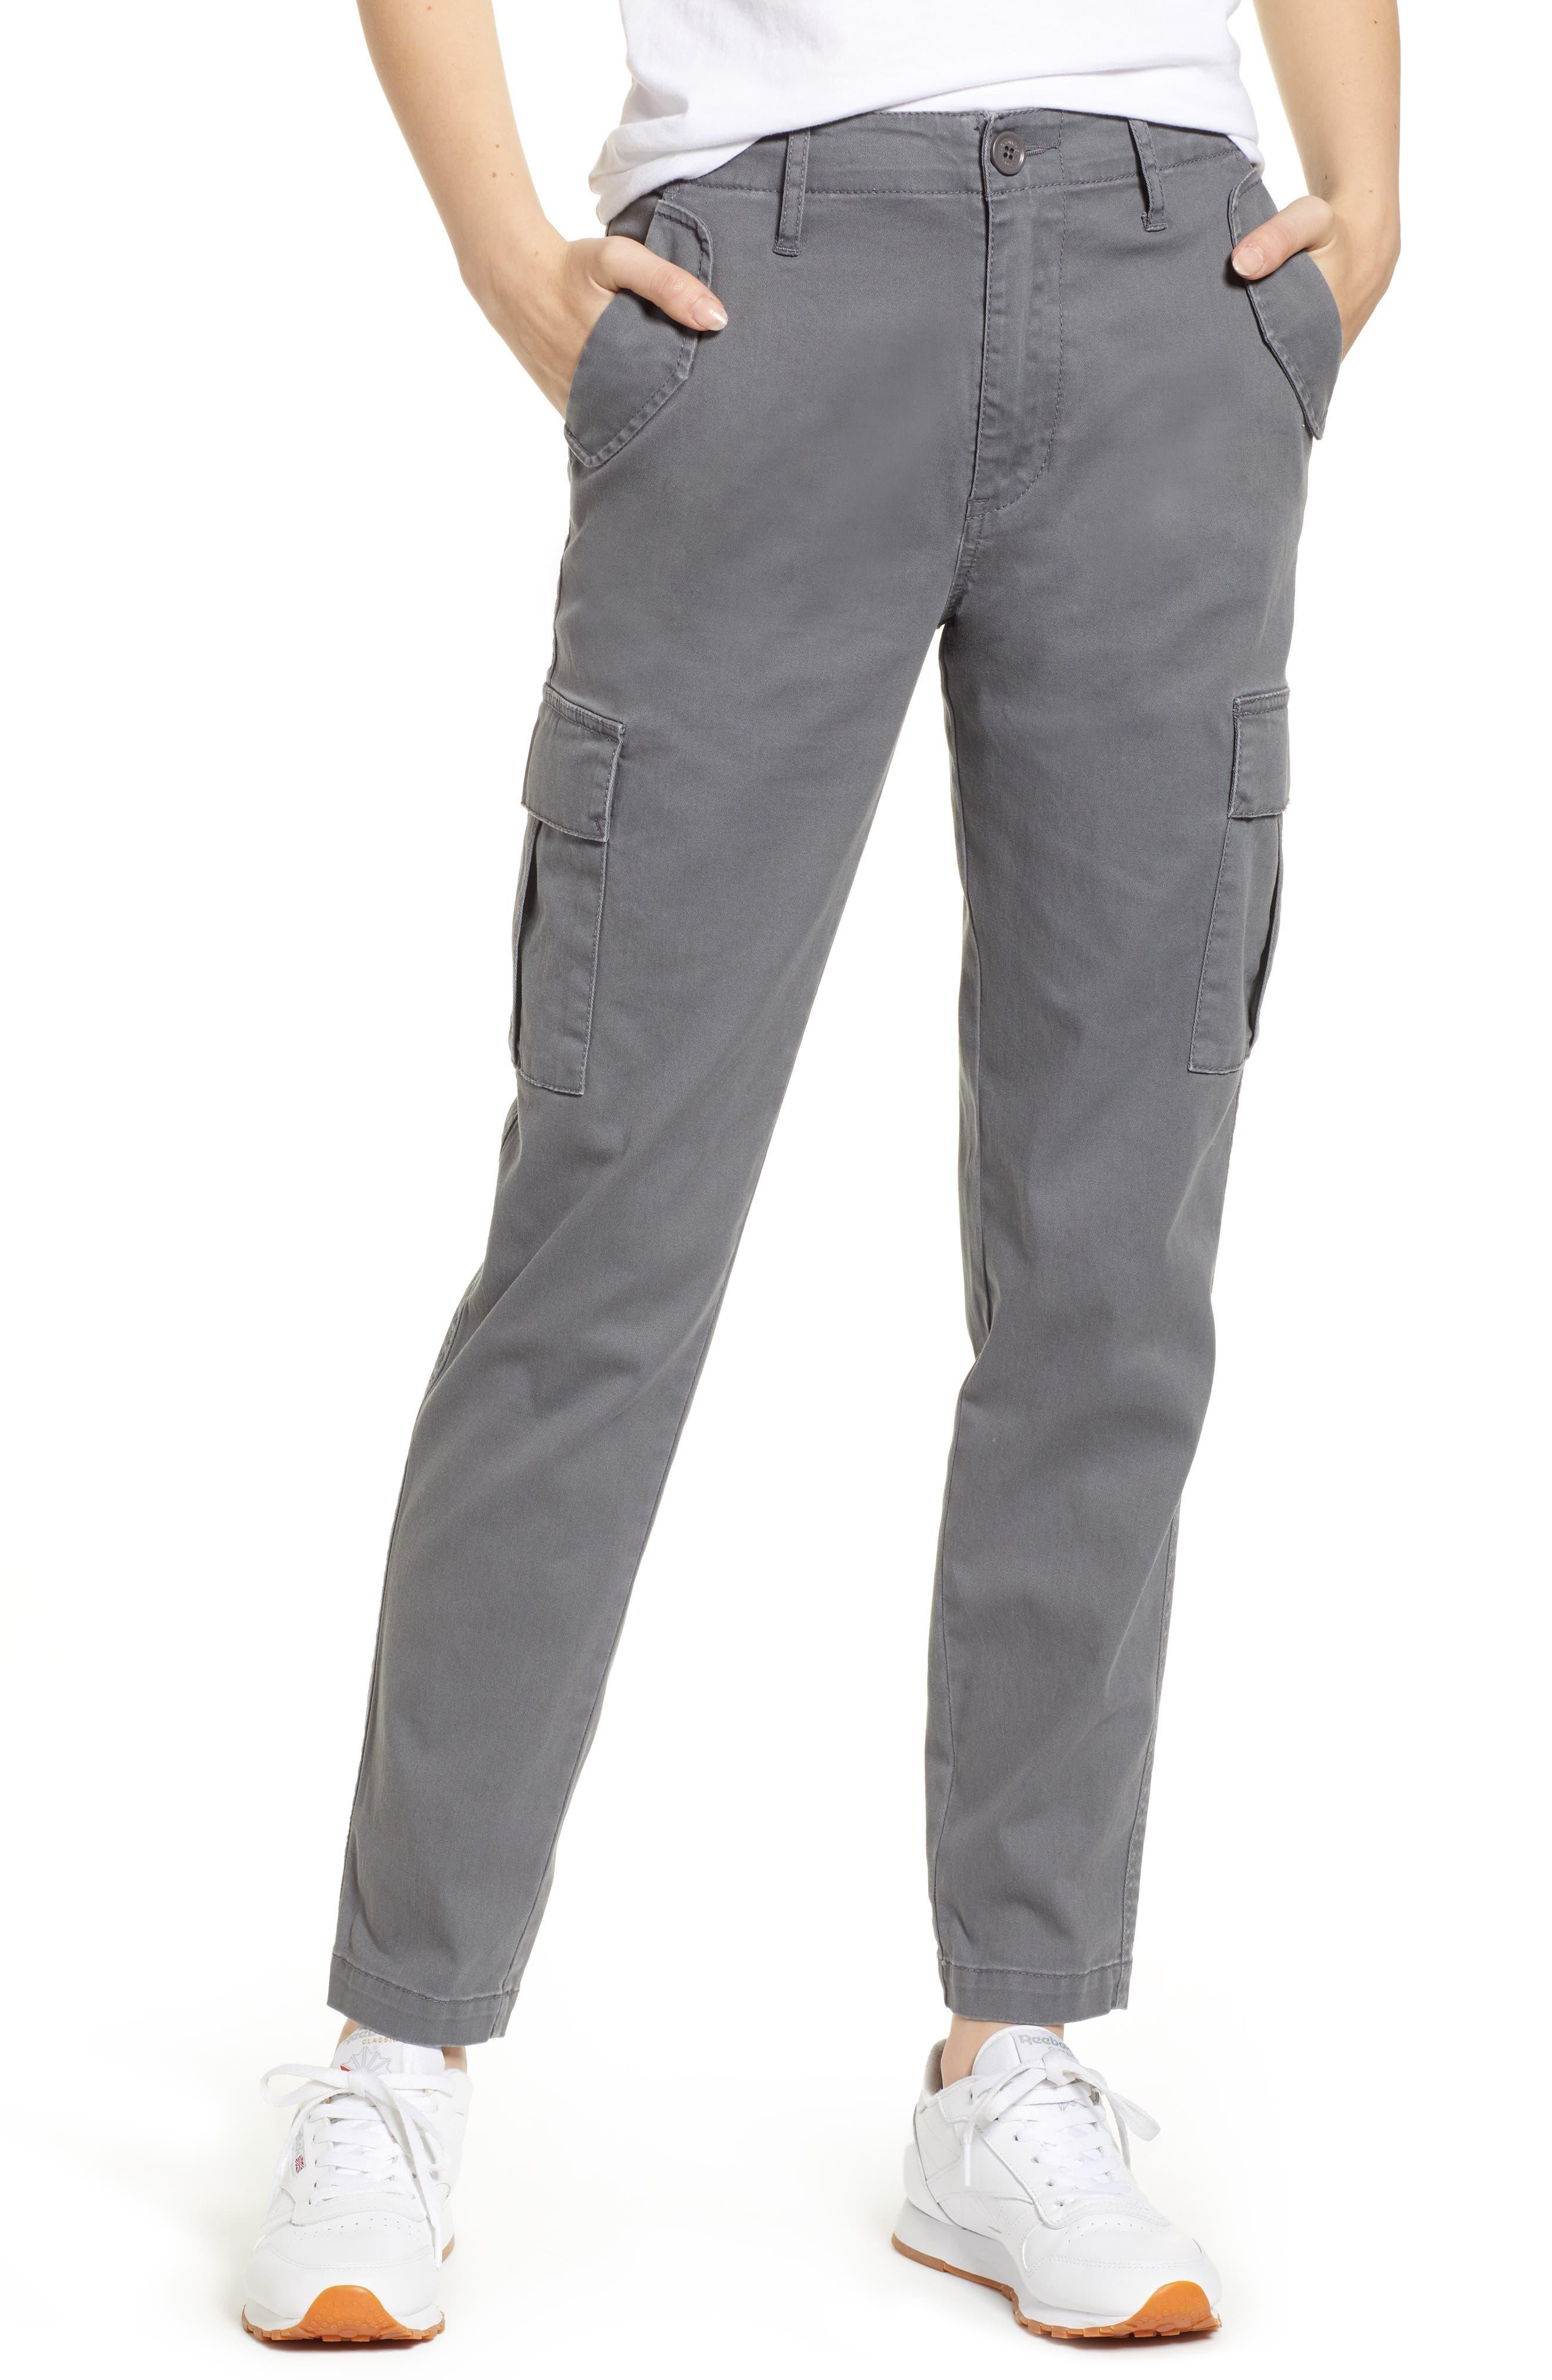 Union Bay Garner Military Cargo Pants, Grey